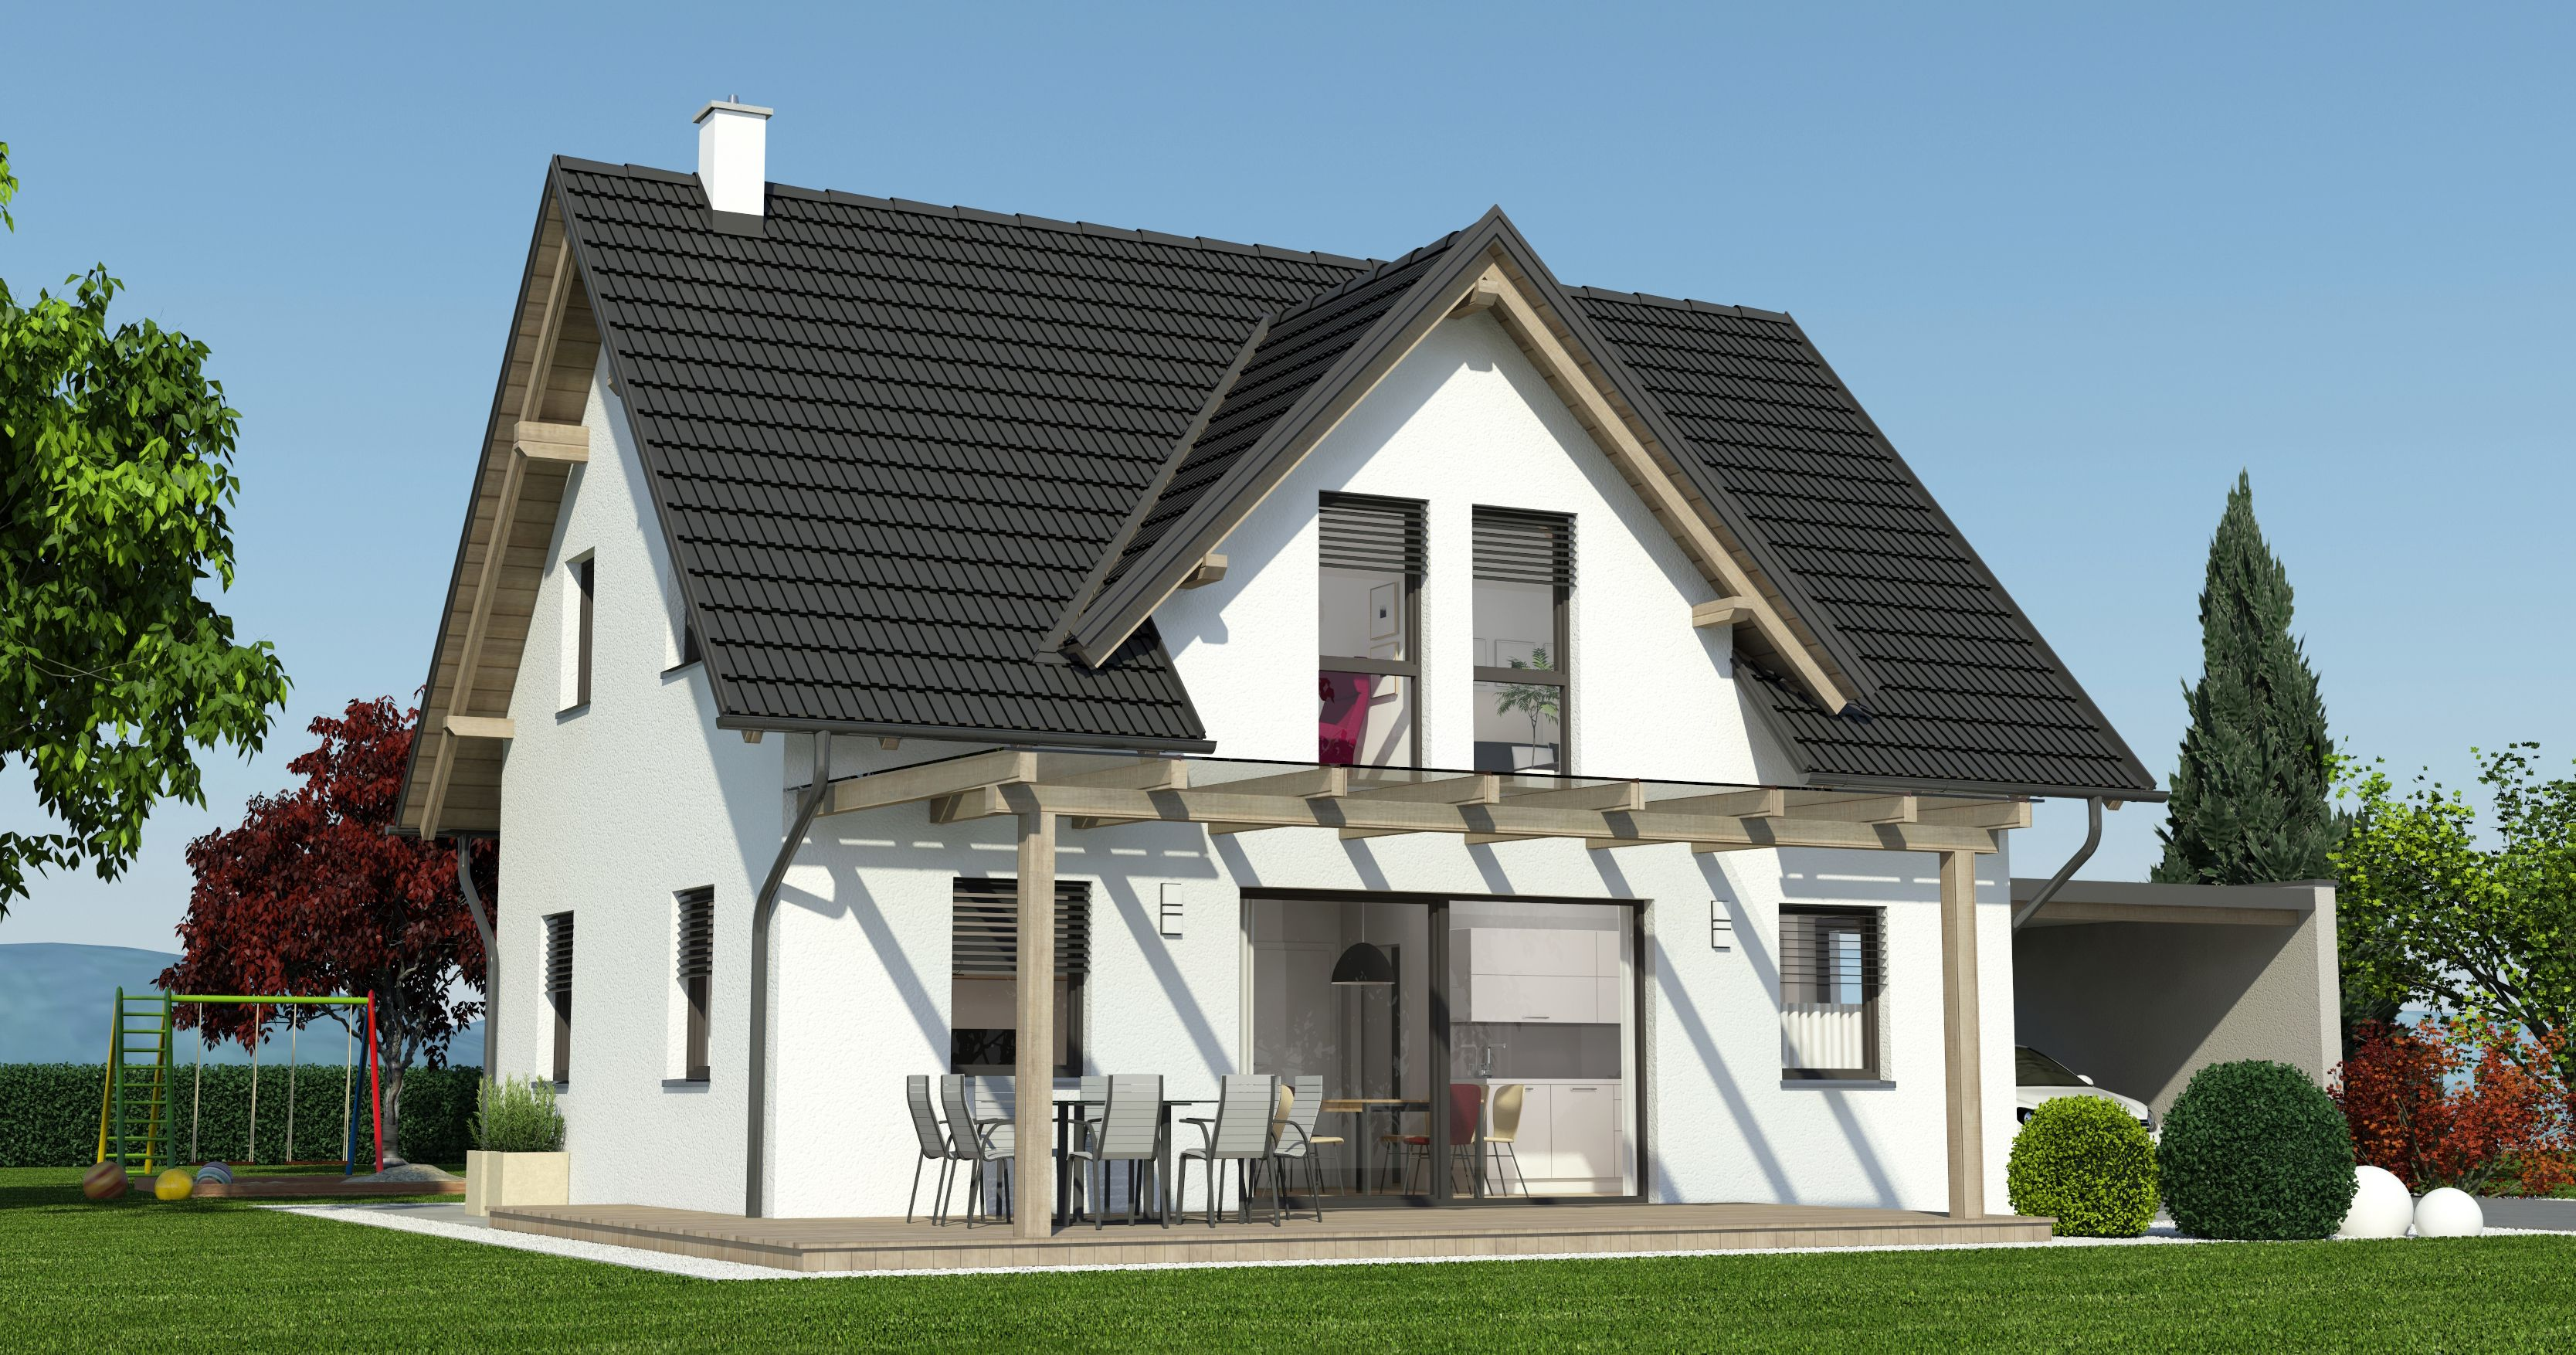 Fertigteilhaus österreich  Fertighaus Steiermark, Fertighaus massiv, Fertighaus ...